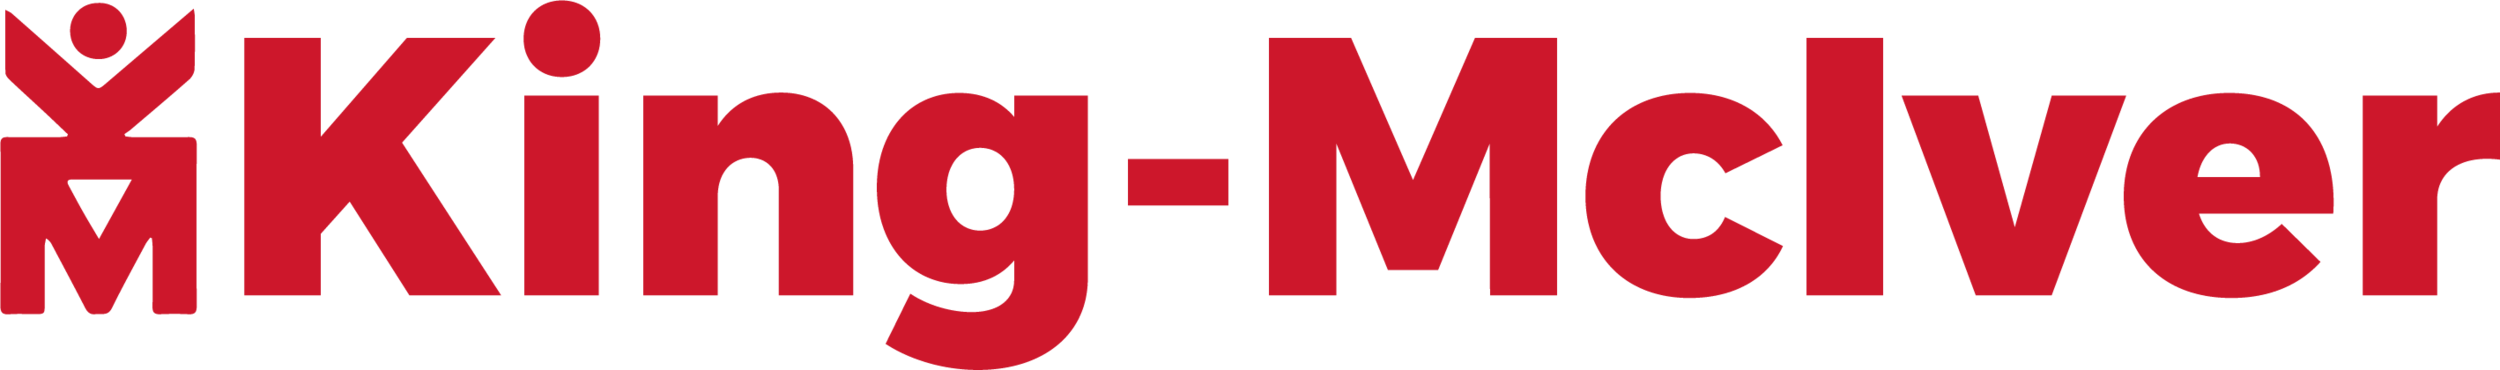 King-McIver logo